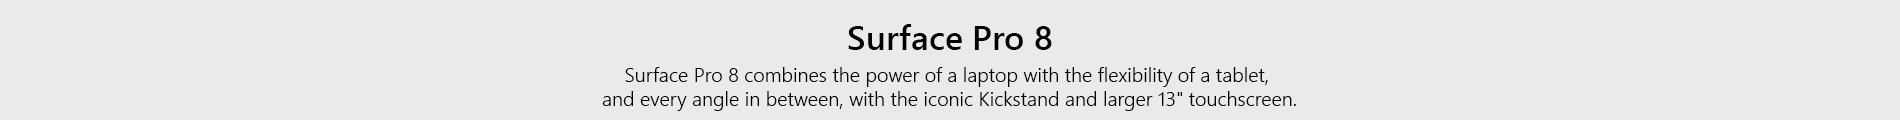 Microsoft Surface Header Landing Page 09.27.21 Tile 04